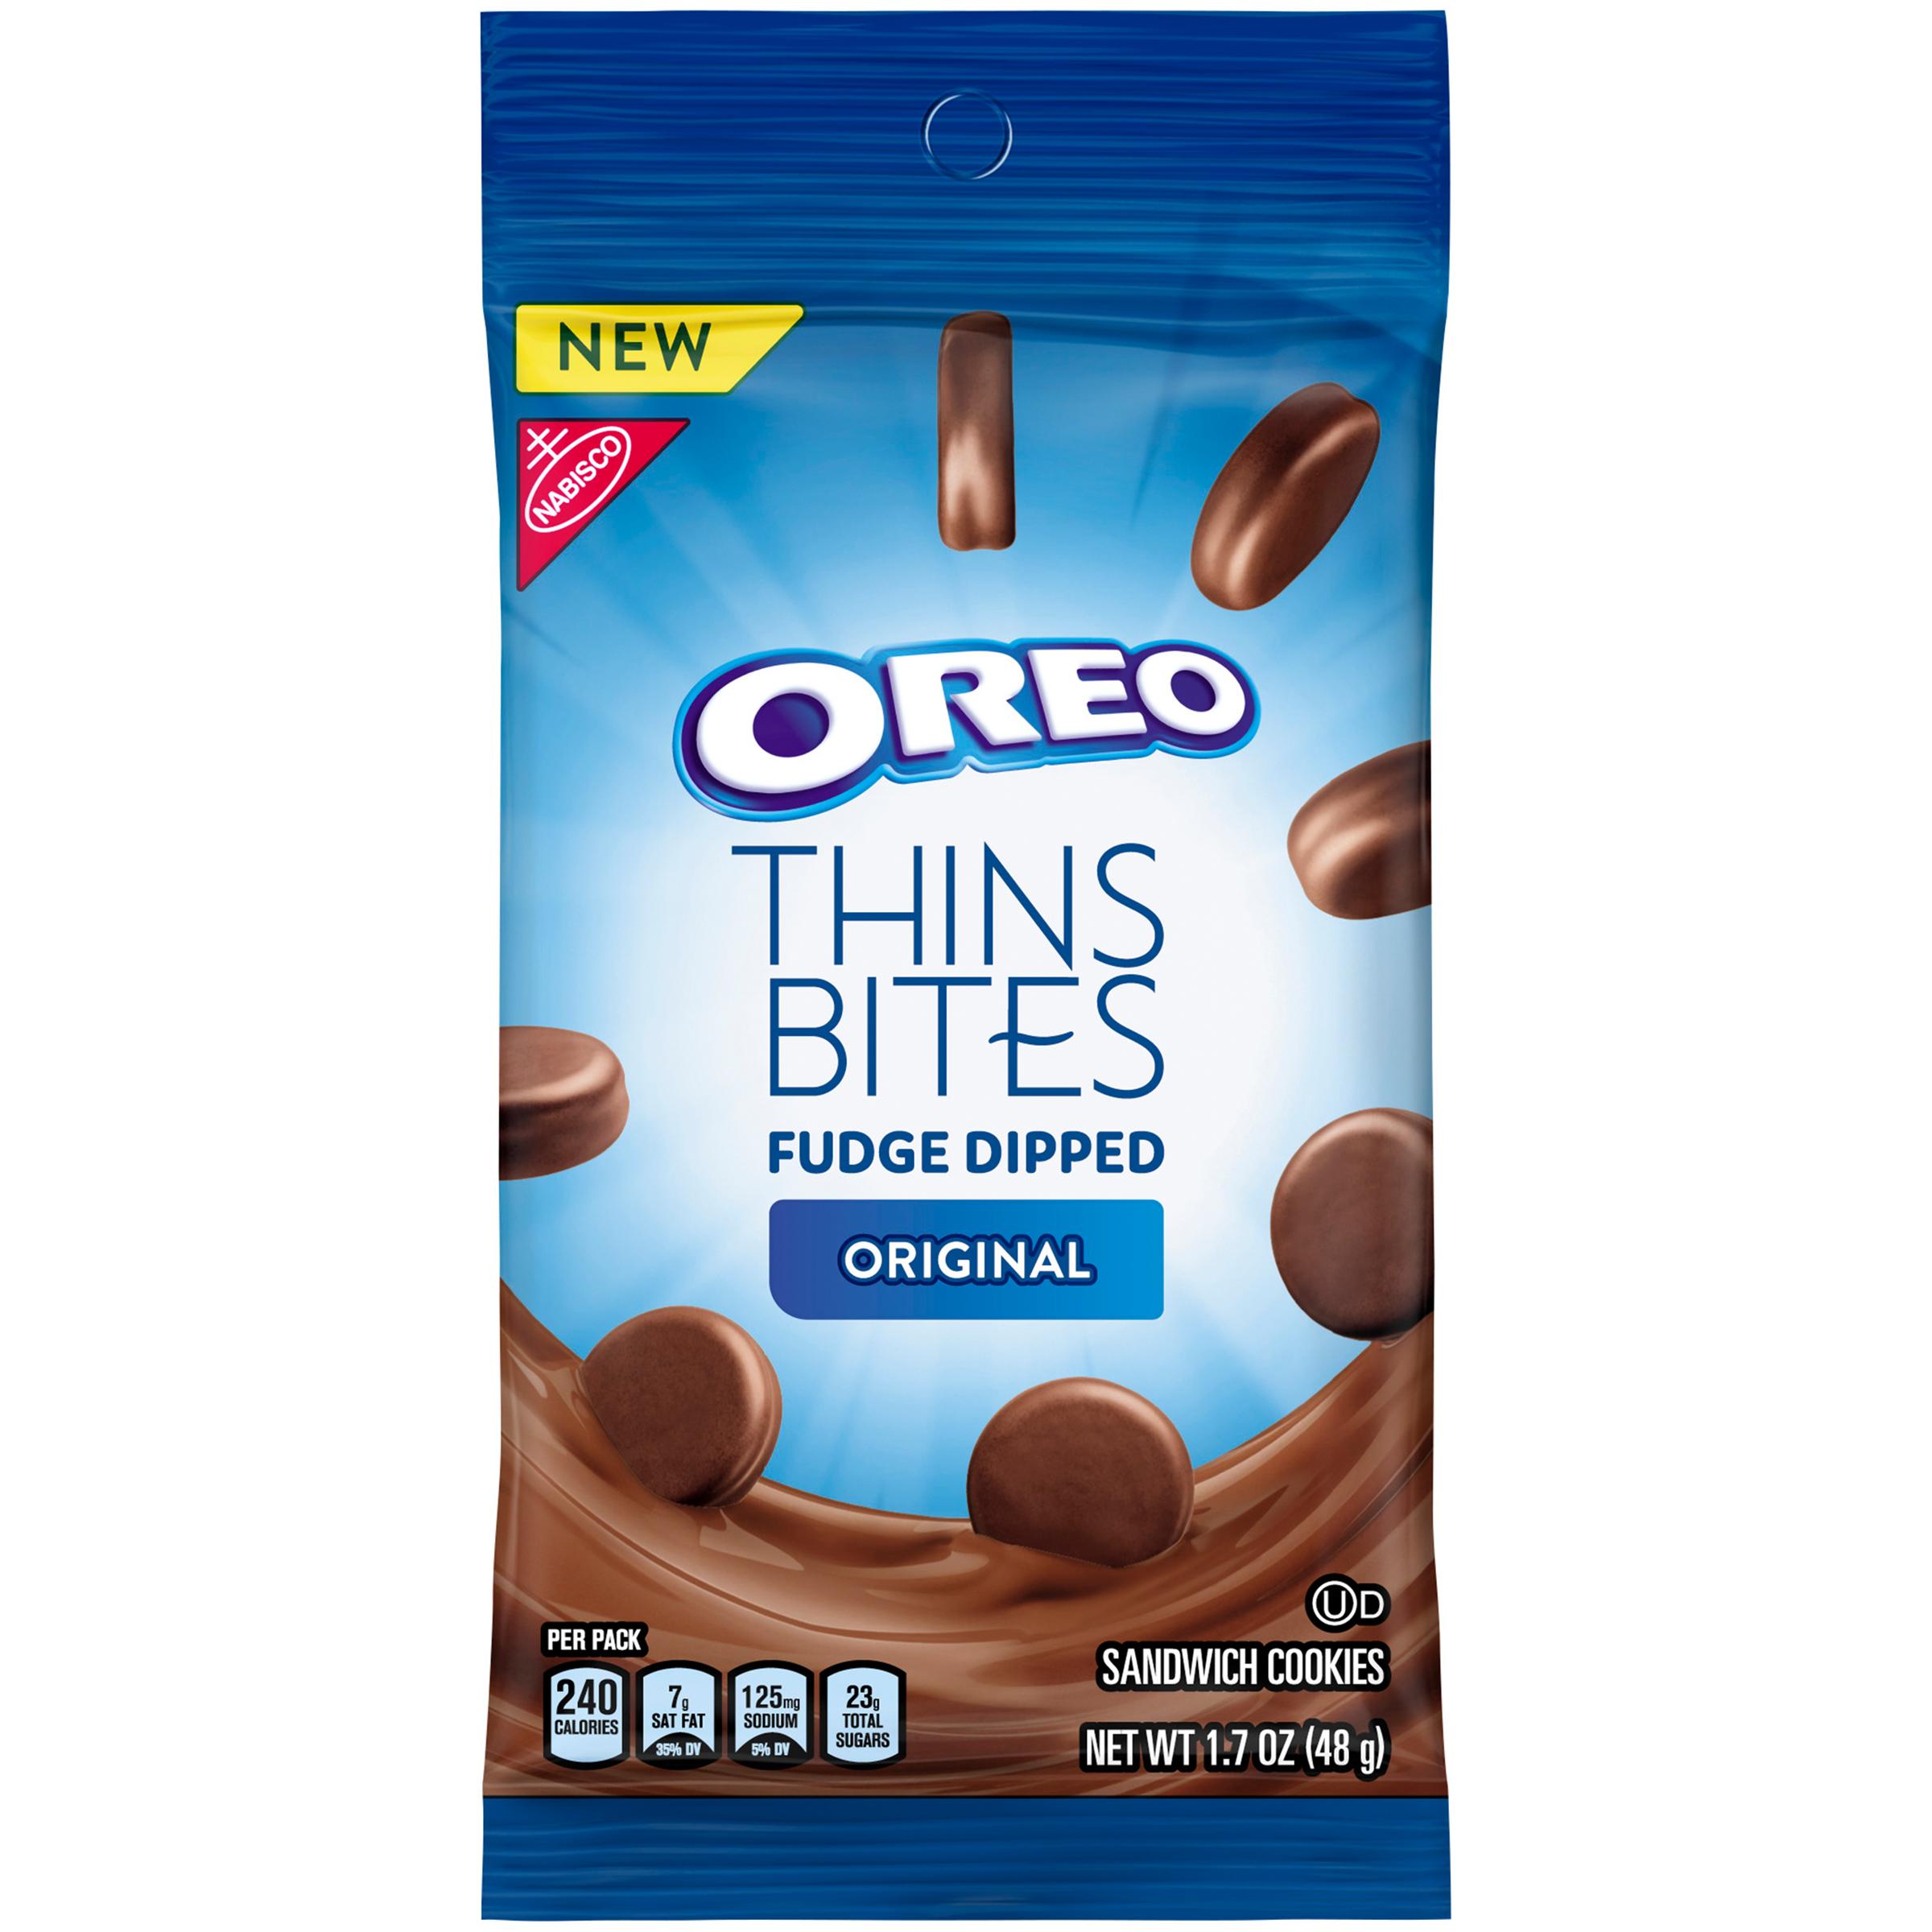 OREO Thin Bites Dipped Original Cookies 1.7 oz